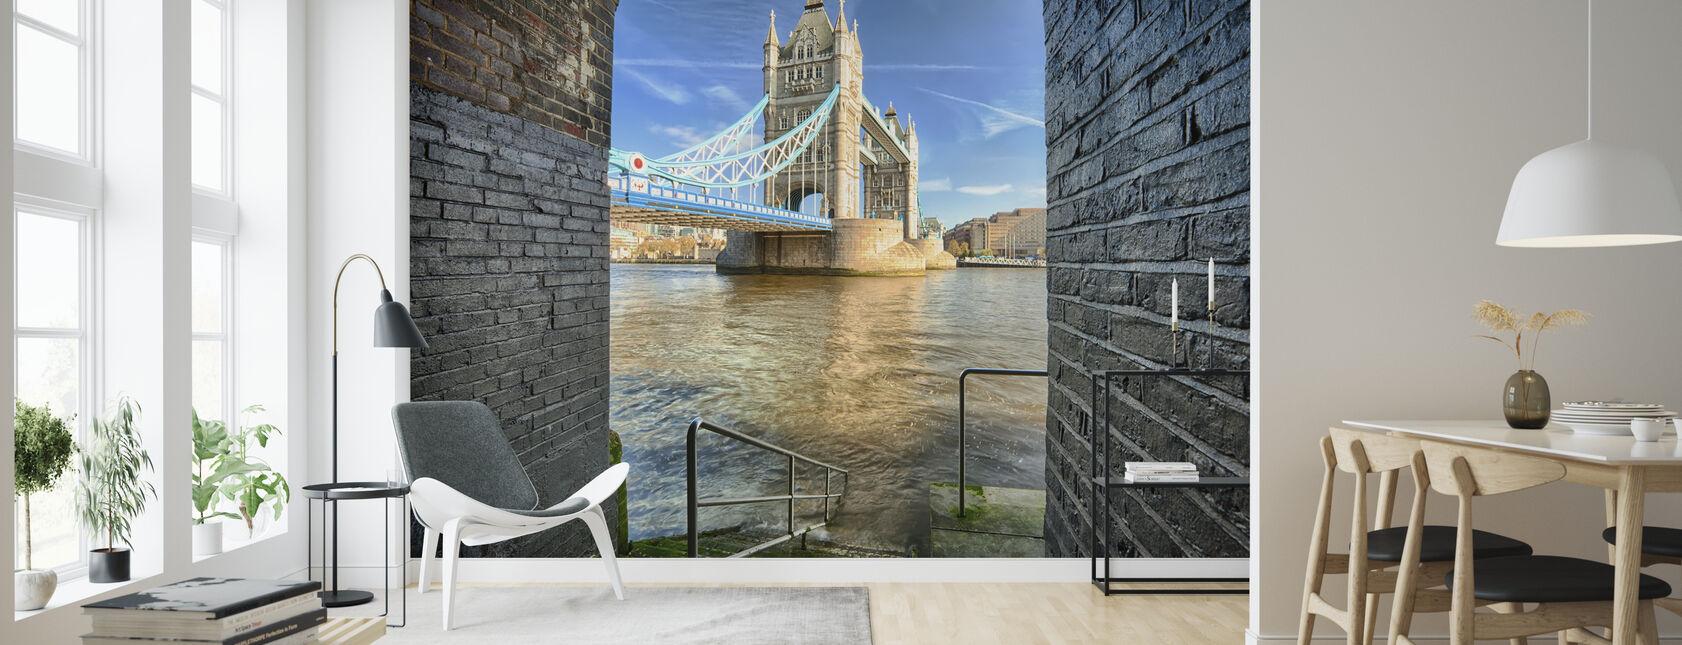 Alternative View on Tower Bridge - Wallpaper - Living Room